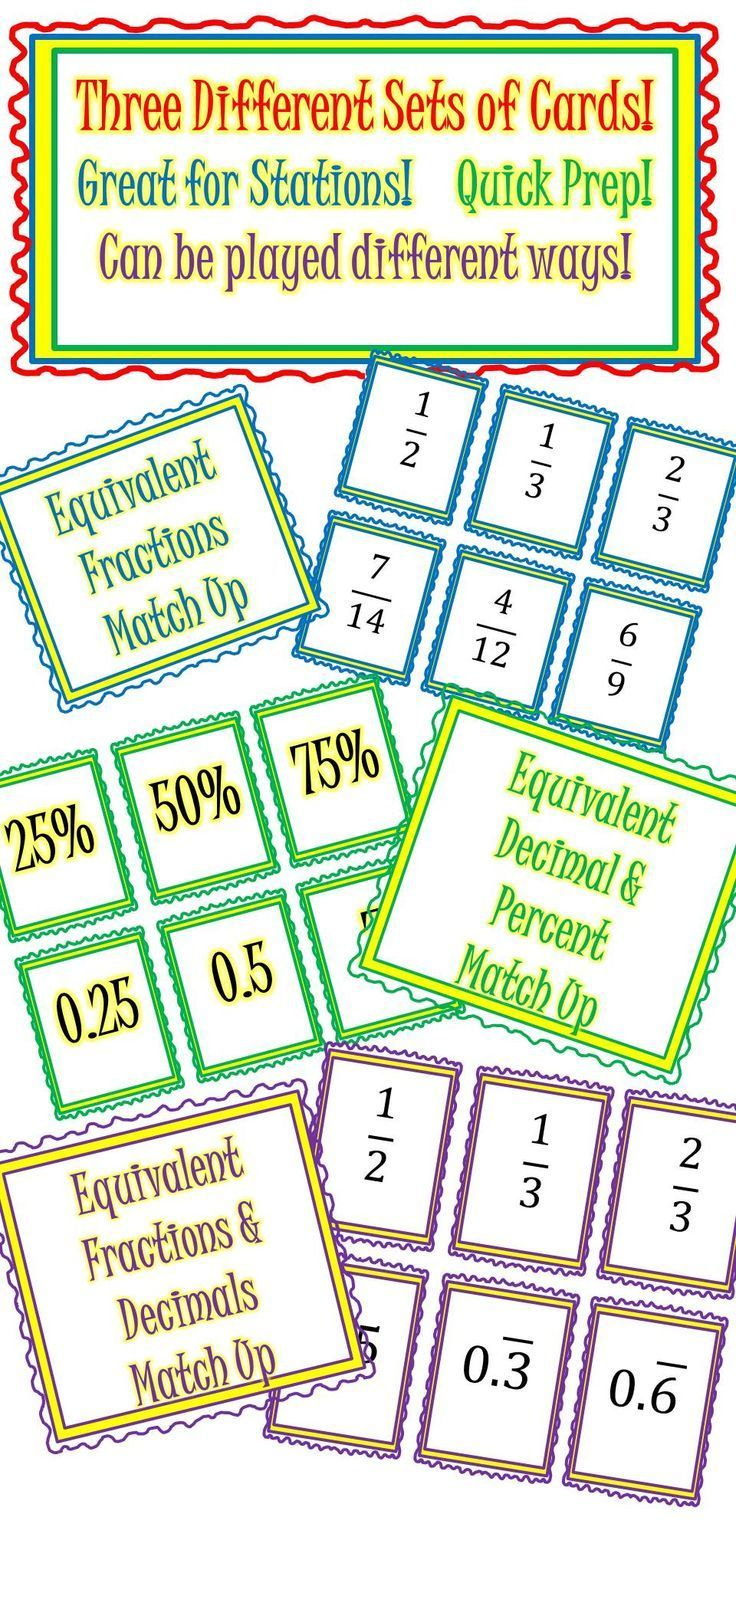 Fractions Decimals & Percents Matching Card Sets - 3 different sets ...